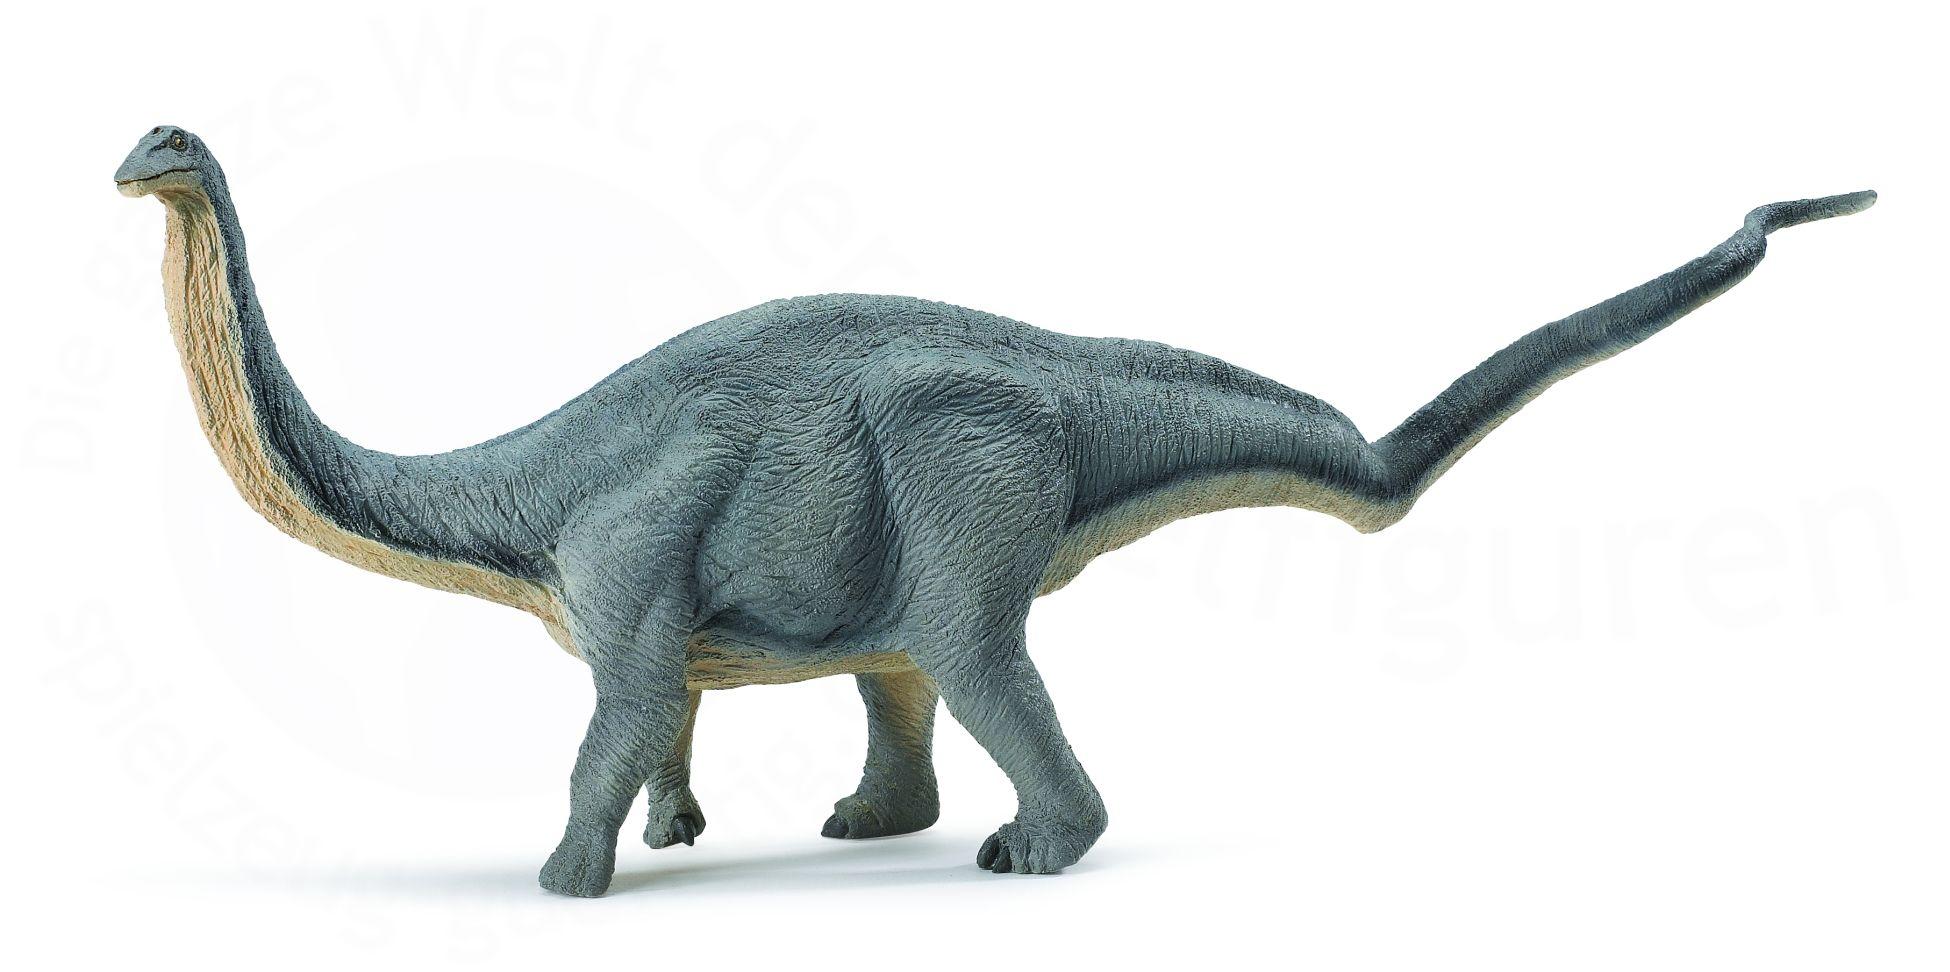 Pics of Dinosaurs – Sauropods – Apatosaurus